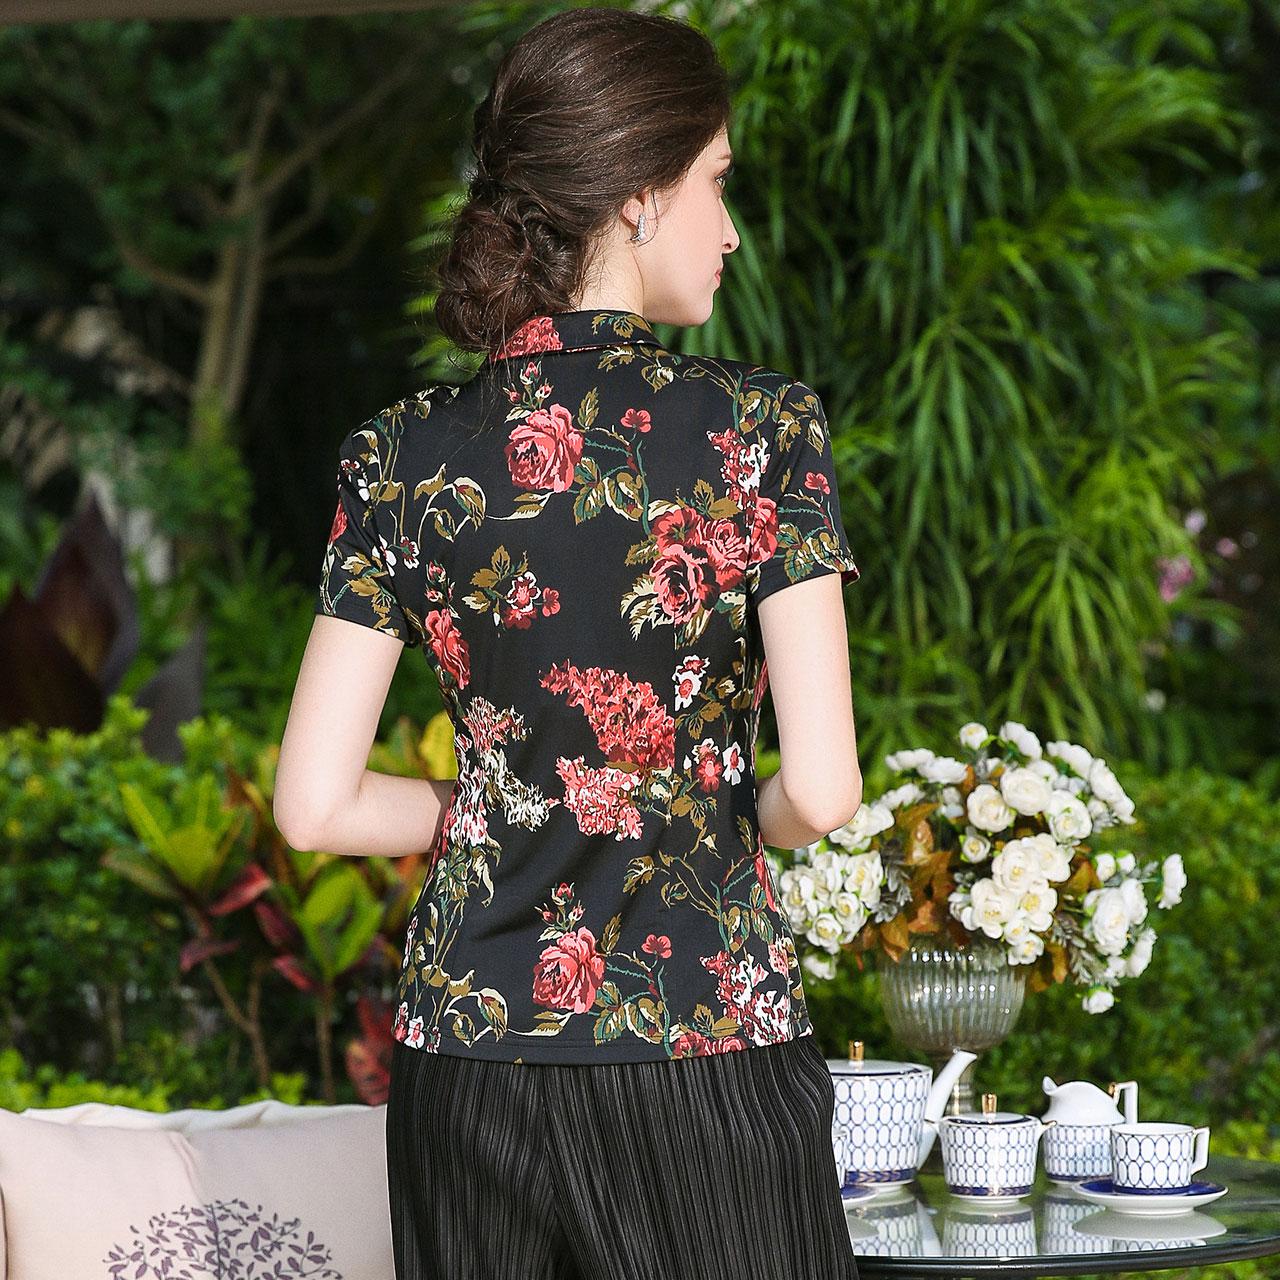 MORELINE沐兰夏季新款女装 修身显瘦优雅印花针织短袖衬衣9234402